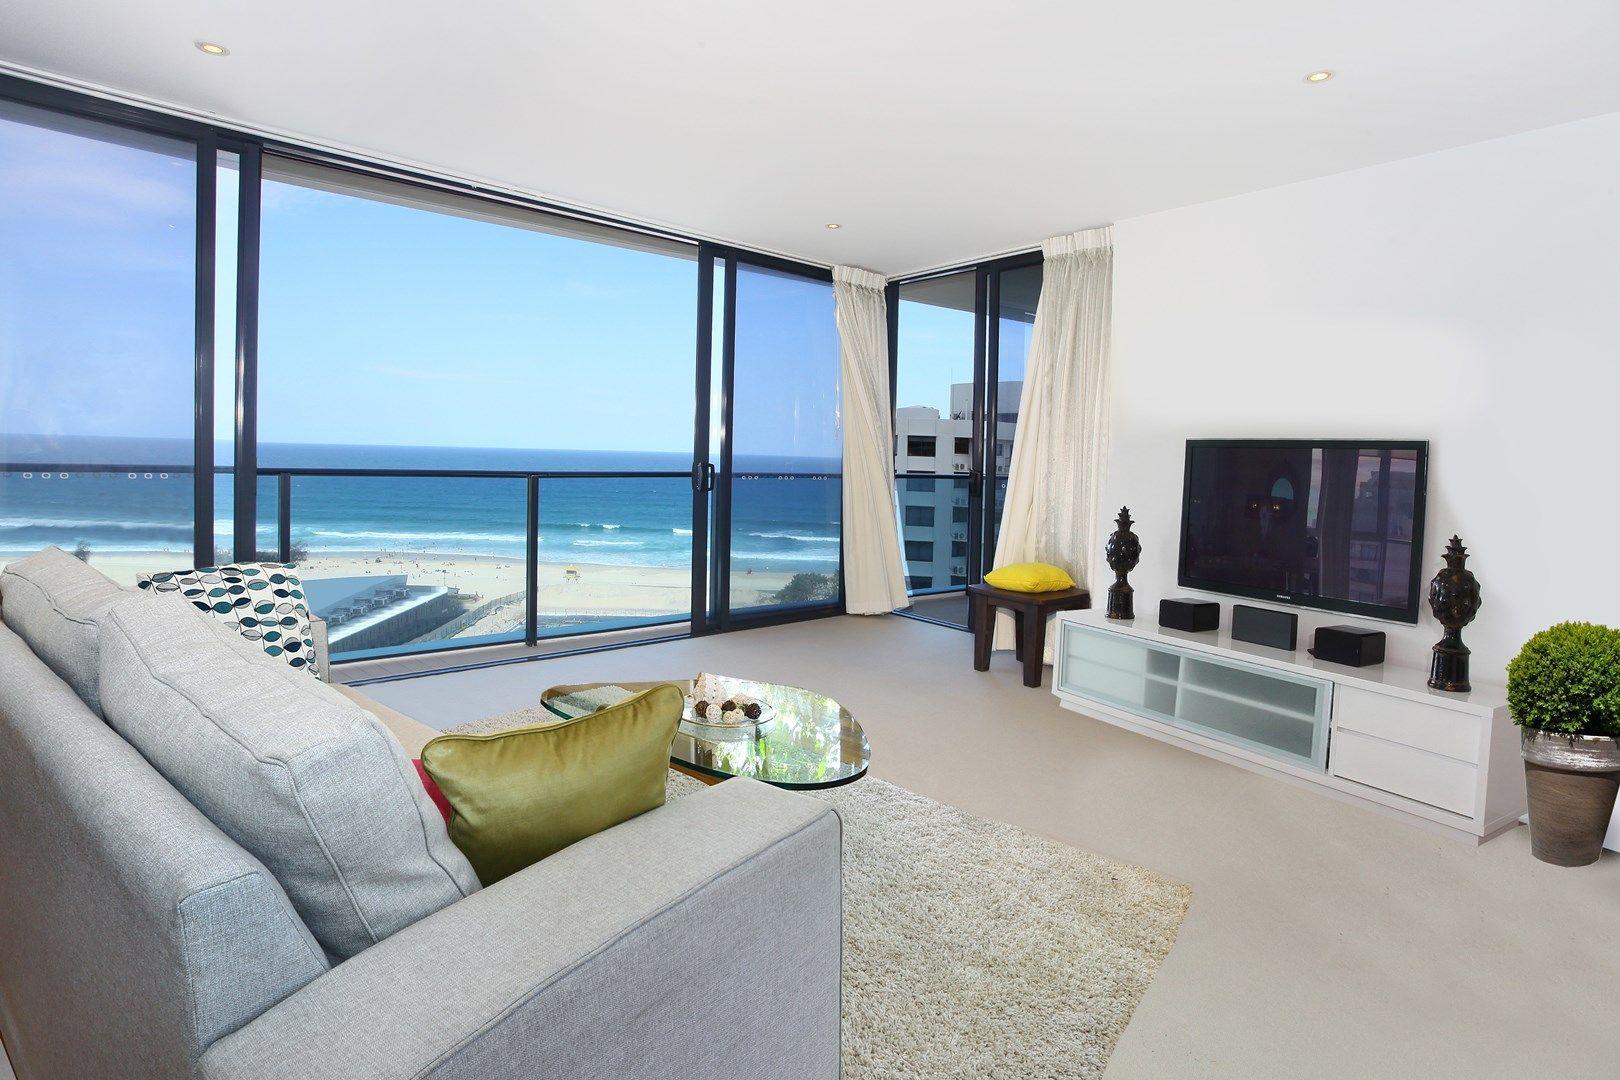 Beach Hotel Broadbeach For Sale